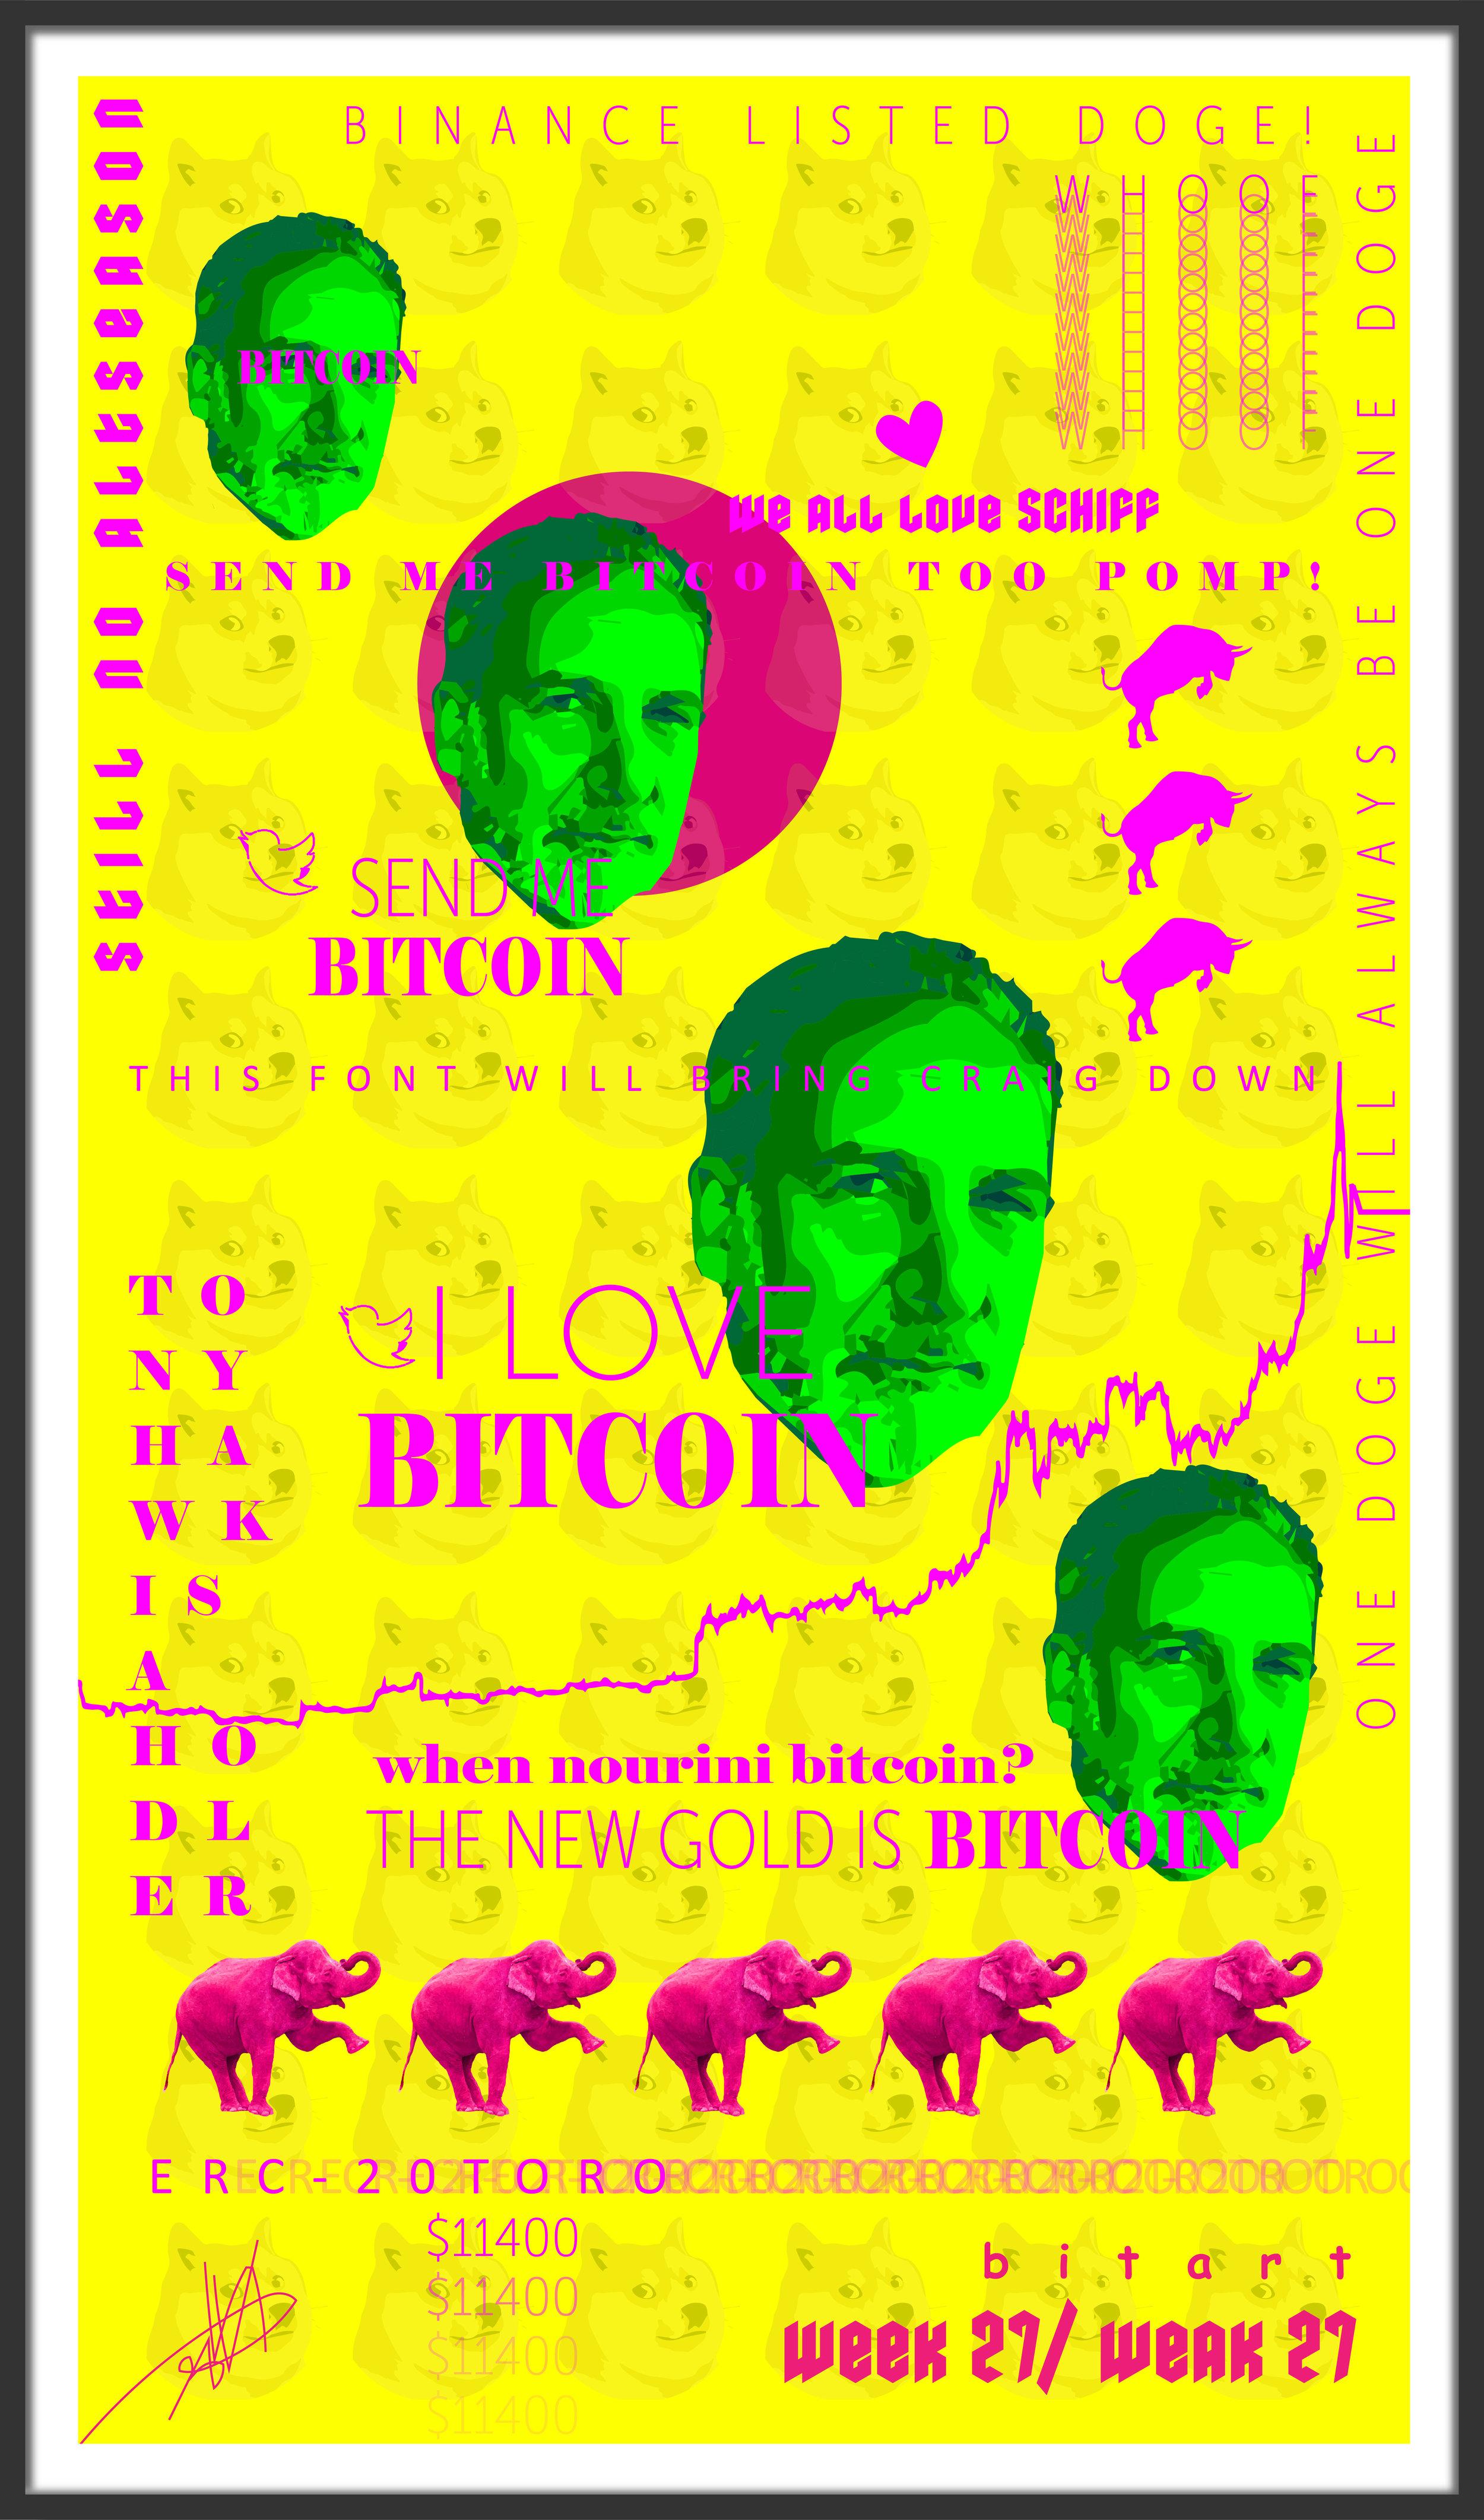 Cryptoart week 27